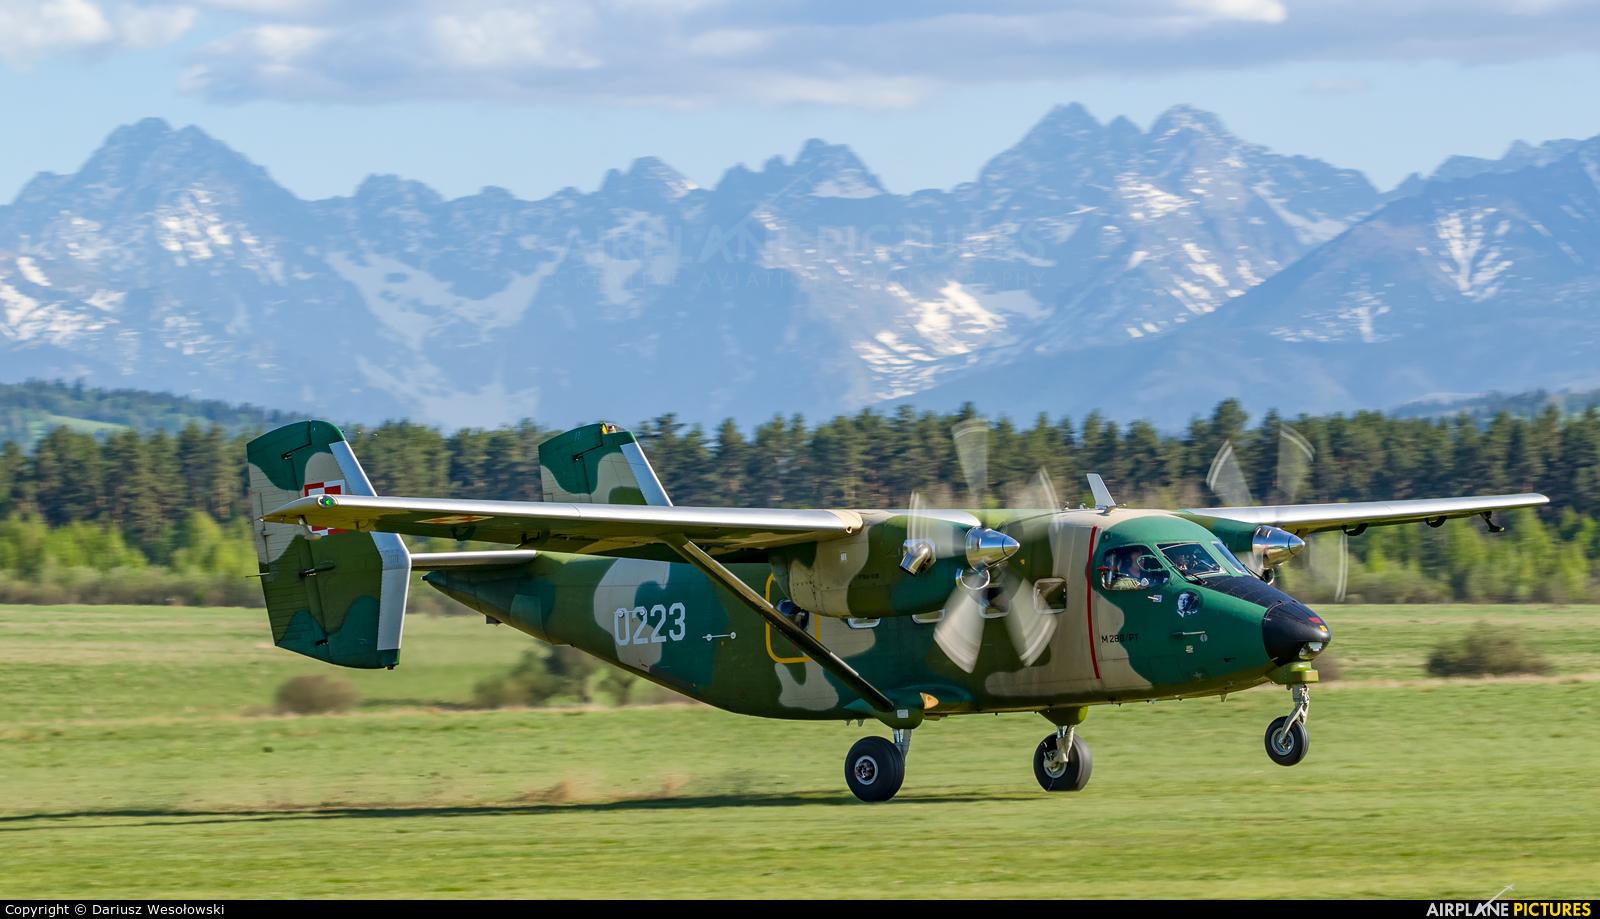 Poland - Air Force 0223 aircraft at Nowy Targ